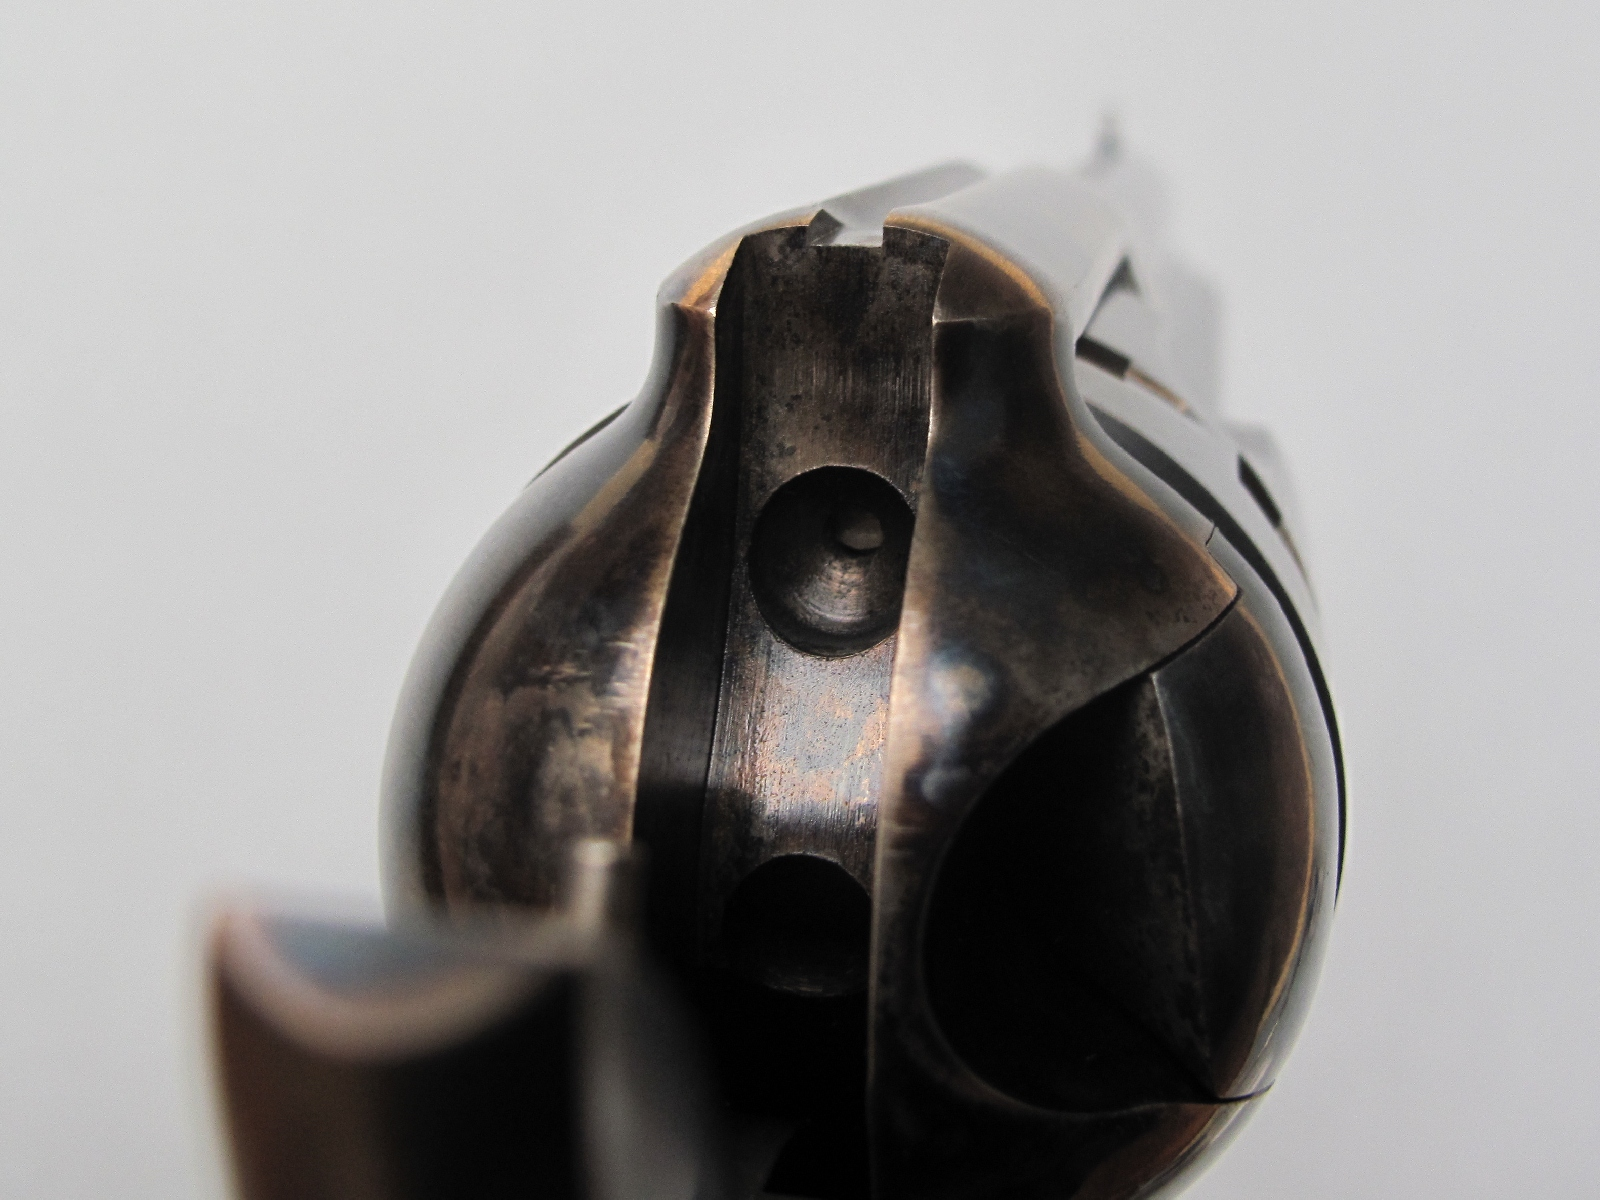 Essai armes | Revolver Uberti modèle 1873 « Cattleman